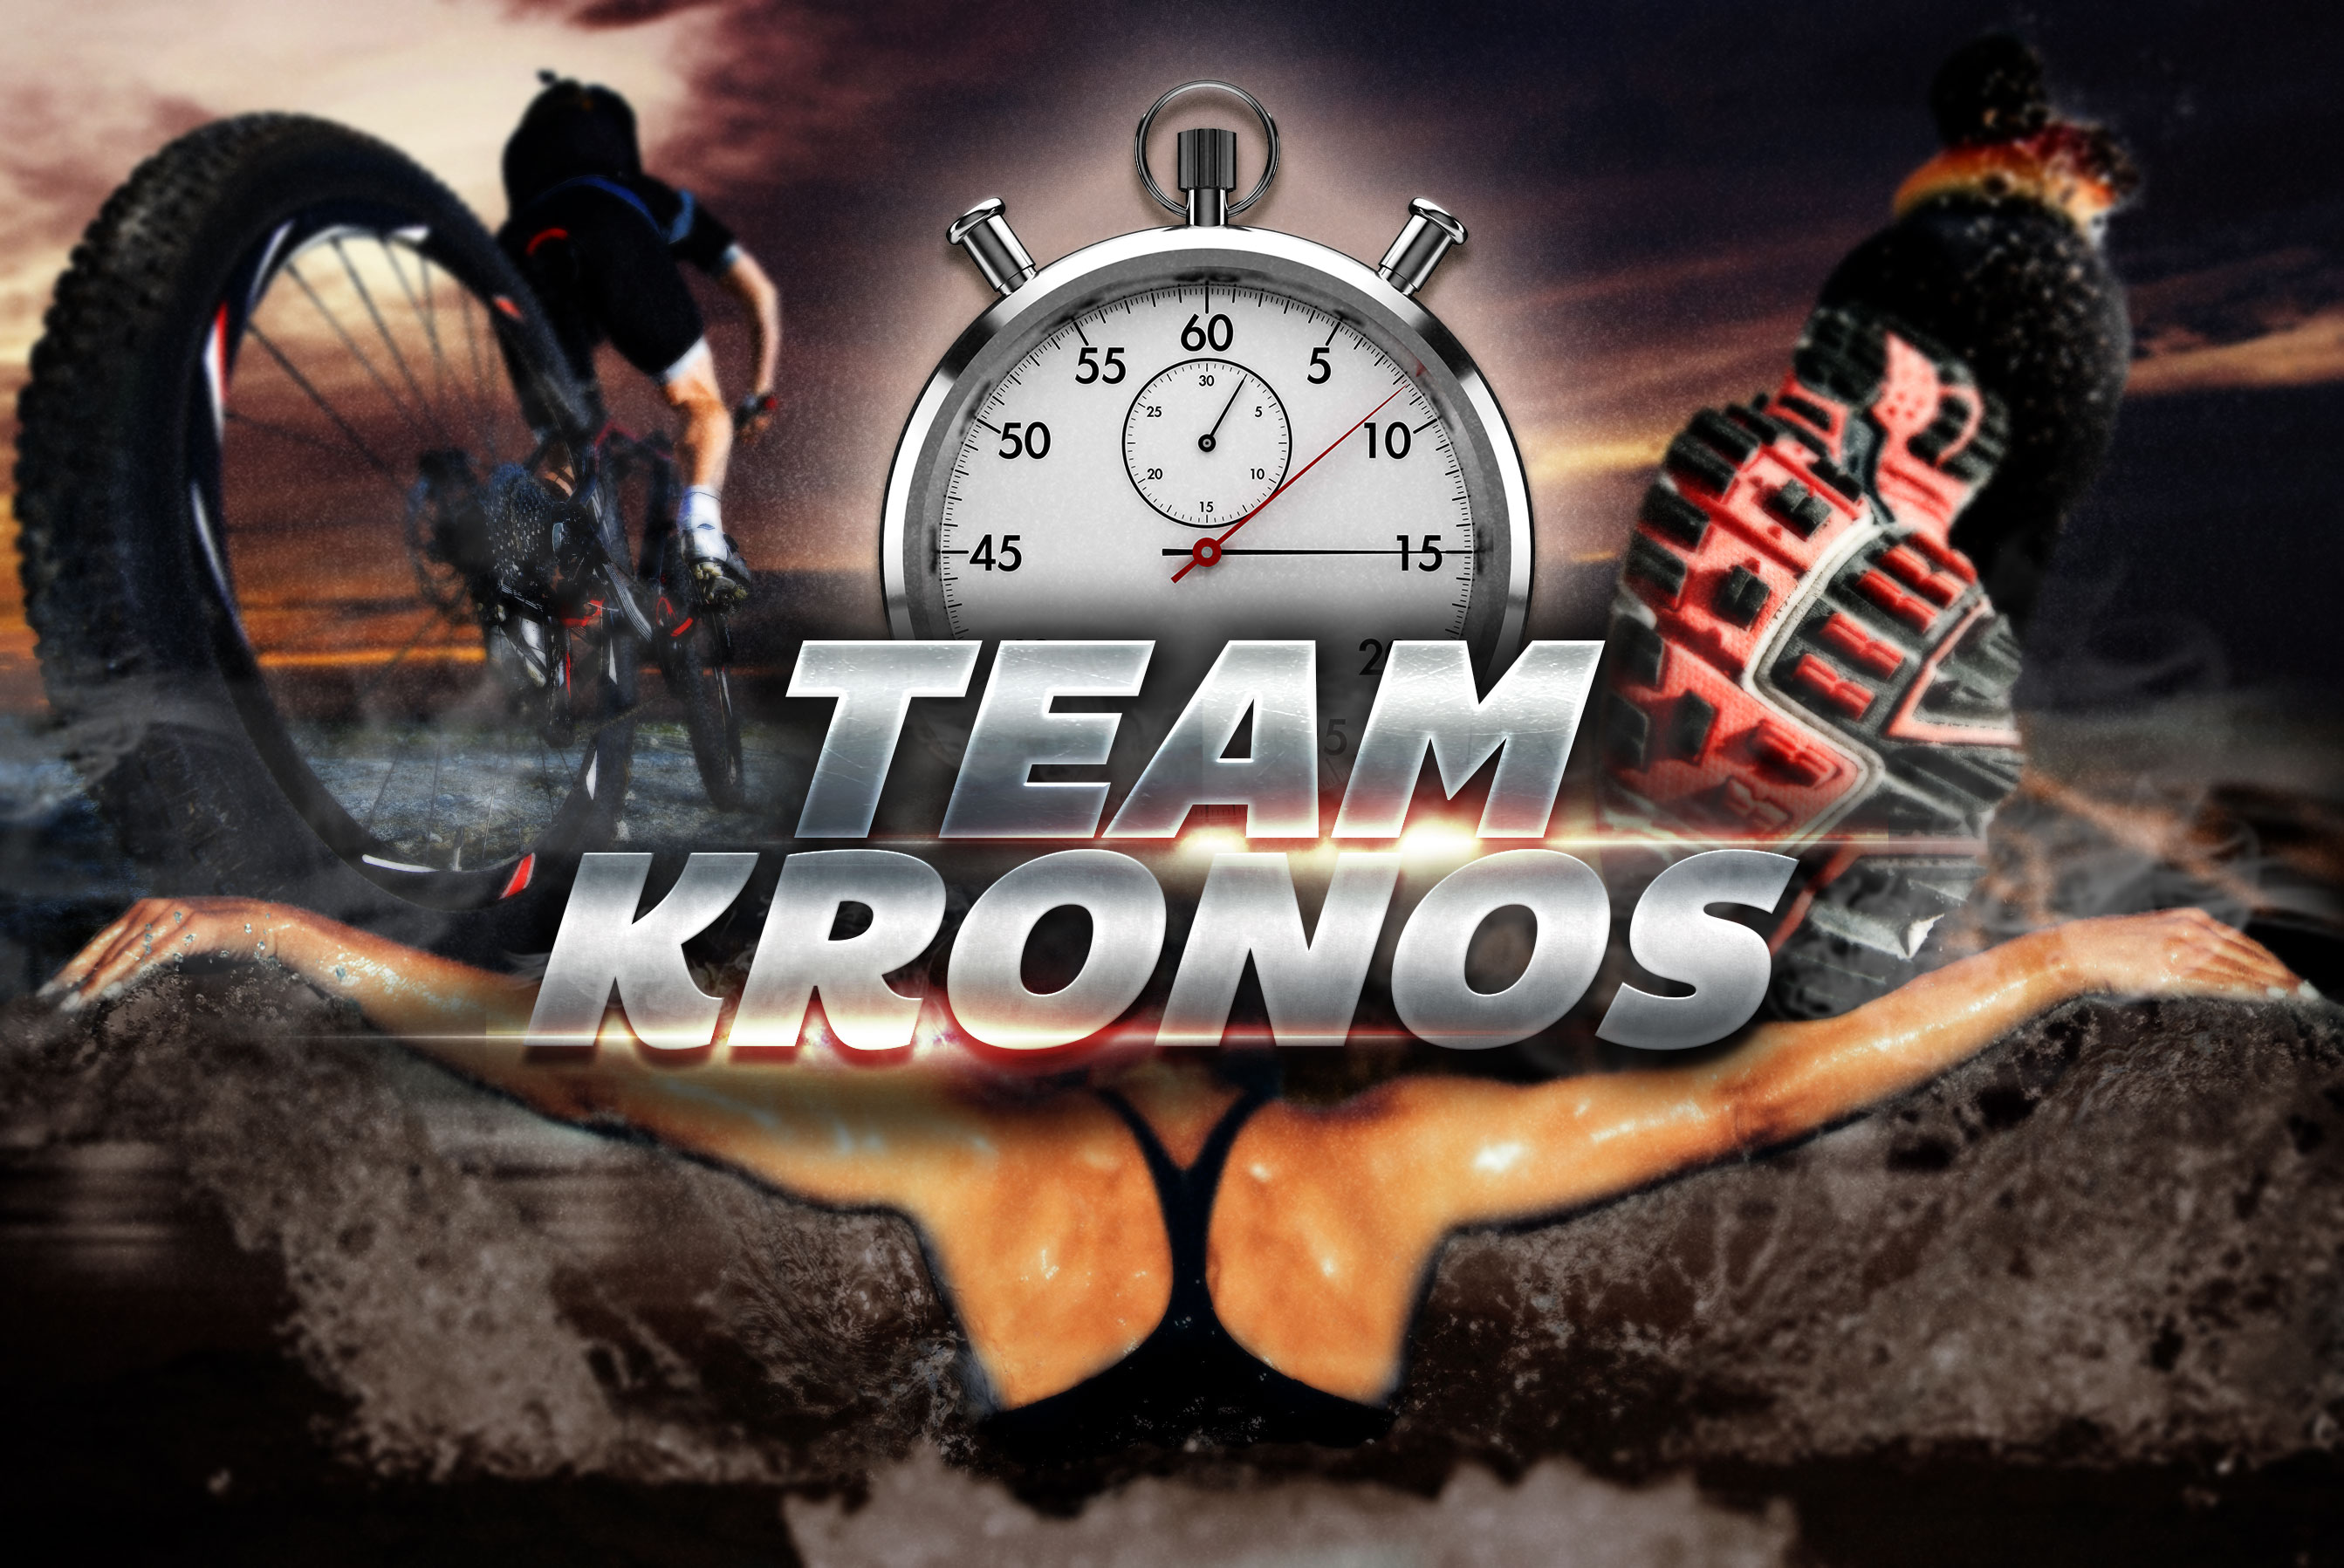 http://teamkronos.com/wp-content/uploads/2015/12/bg-teamkronos.jpg